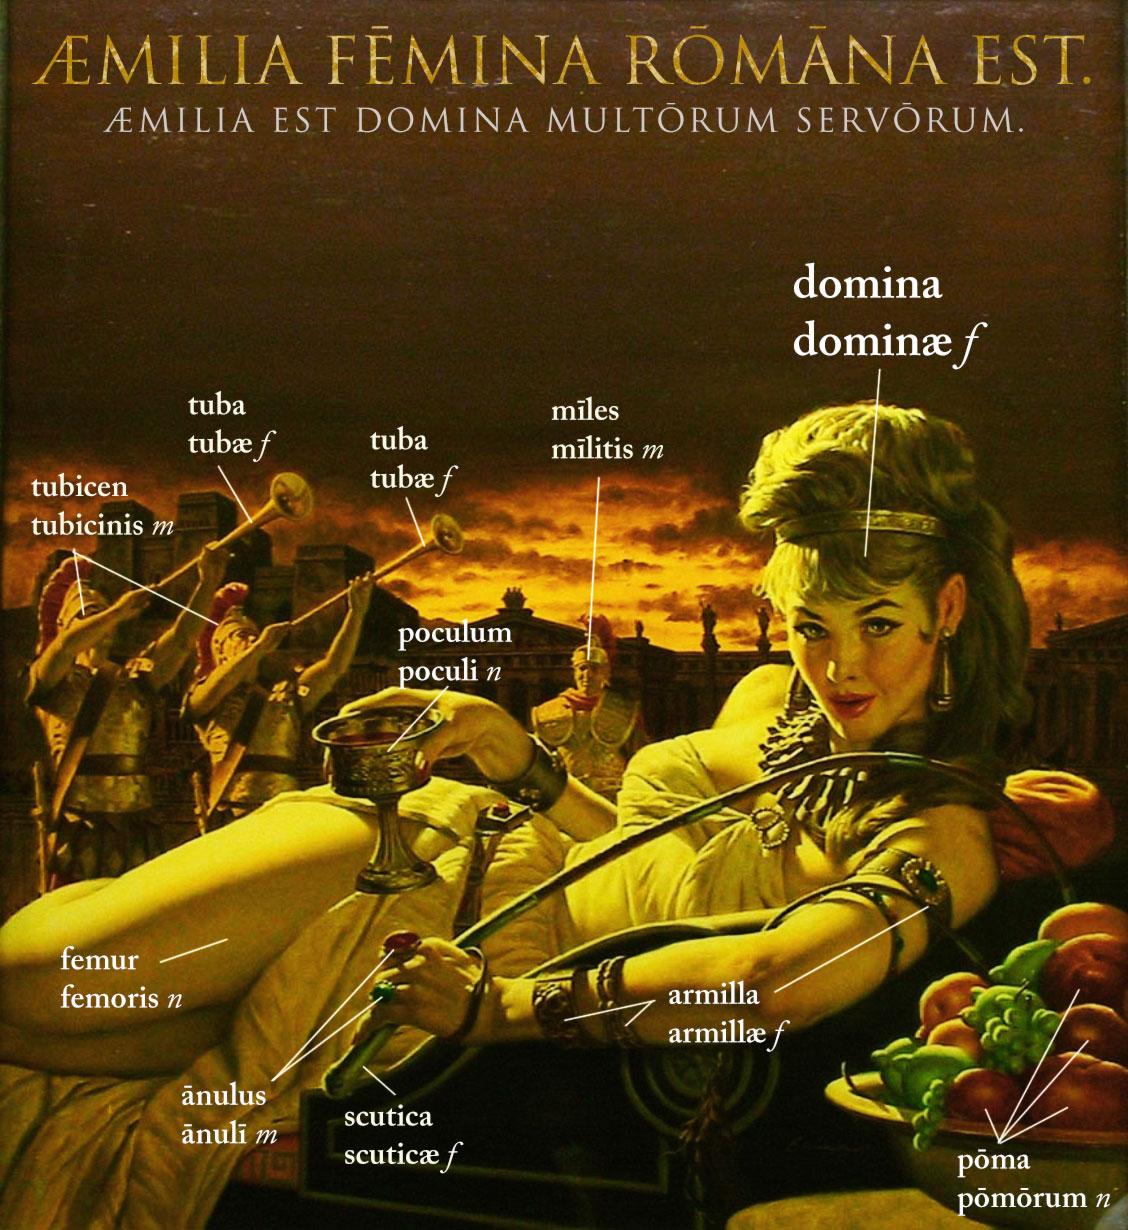 Æmilia fēmina Rōmana est. Æmilia est domina multōrum servōrum.